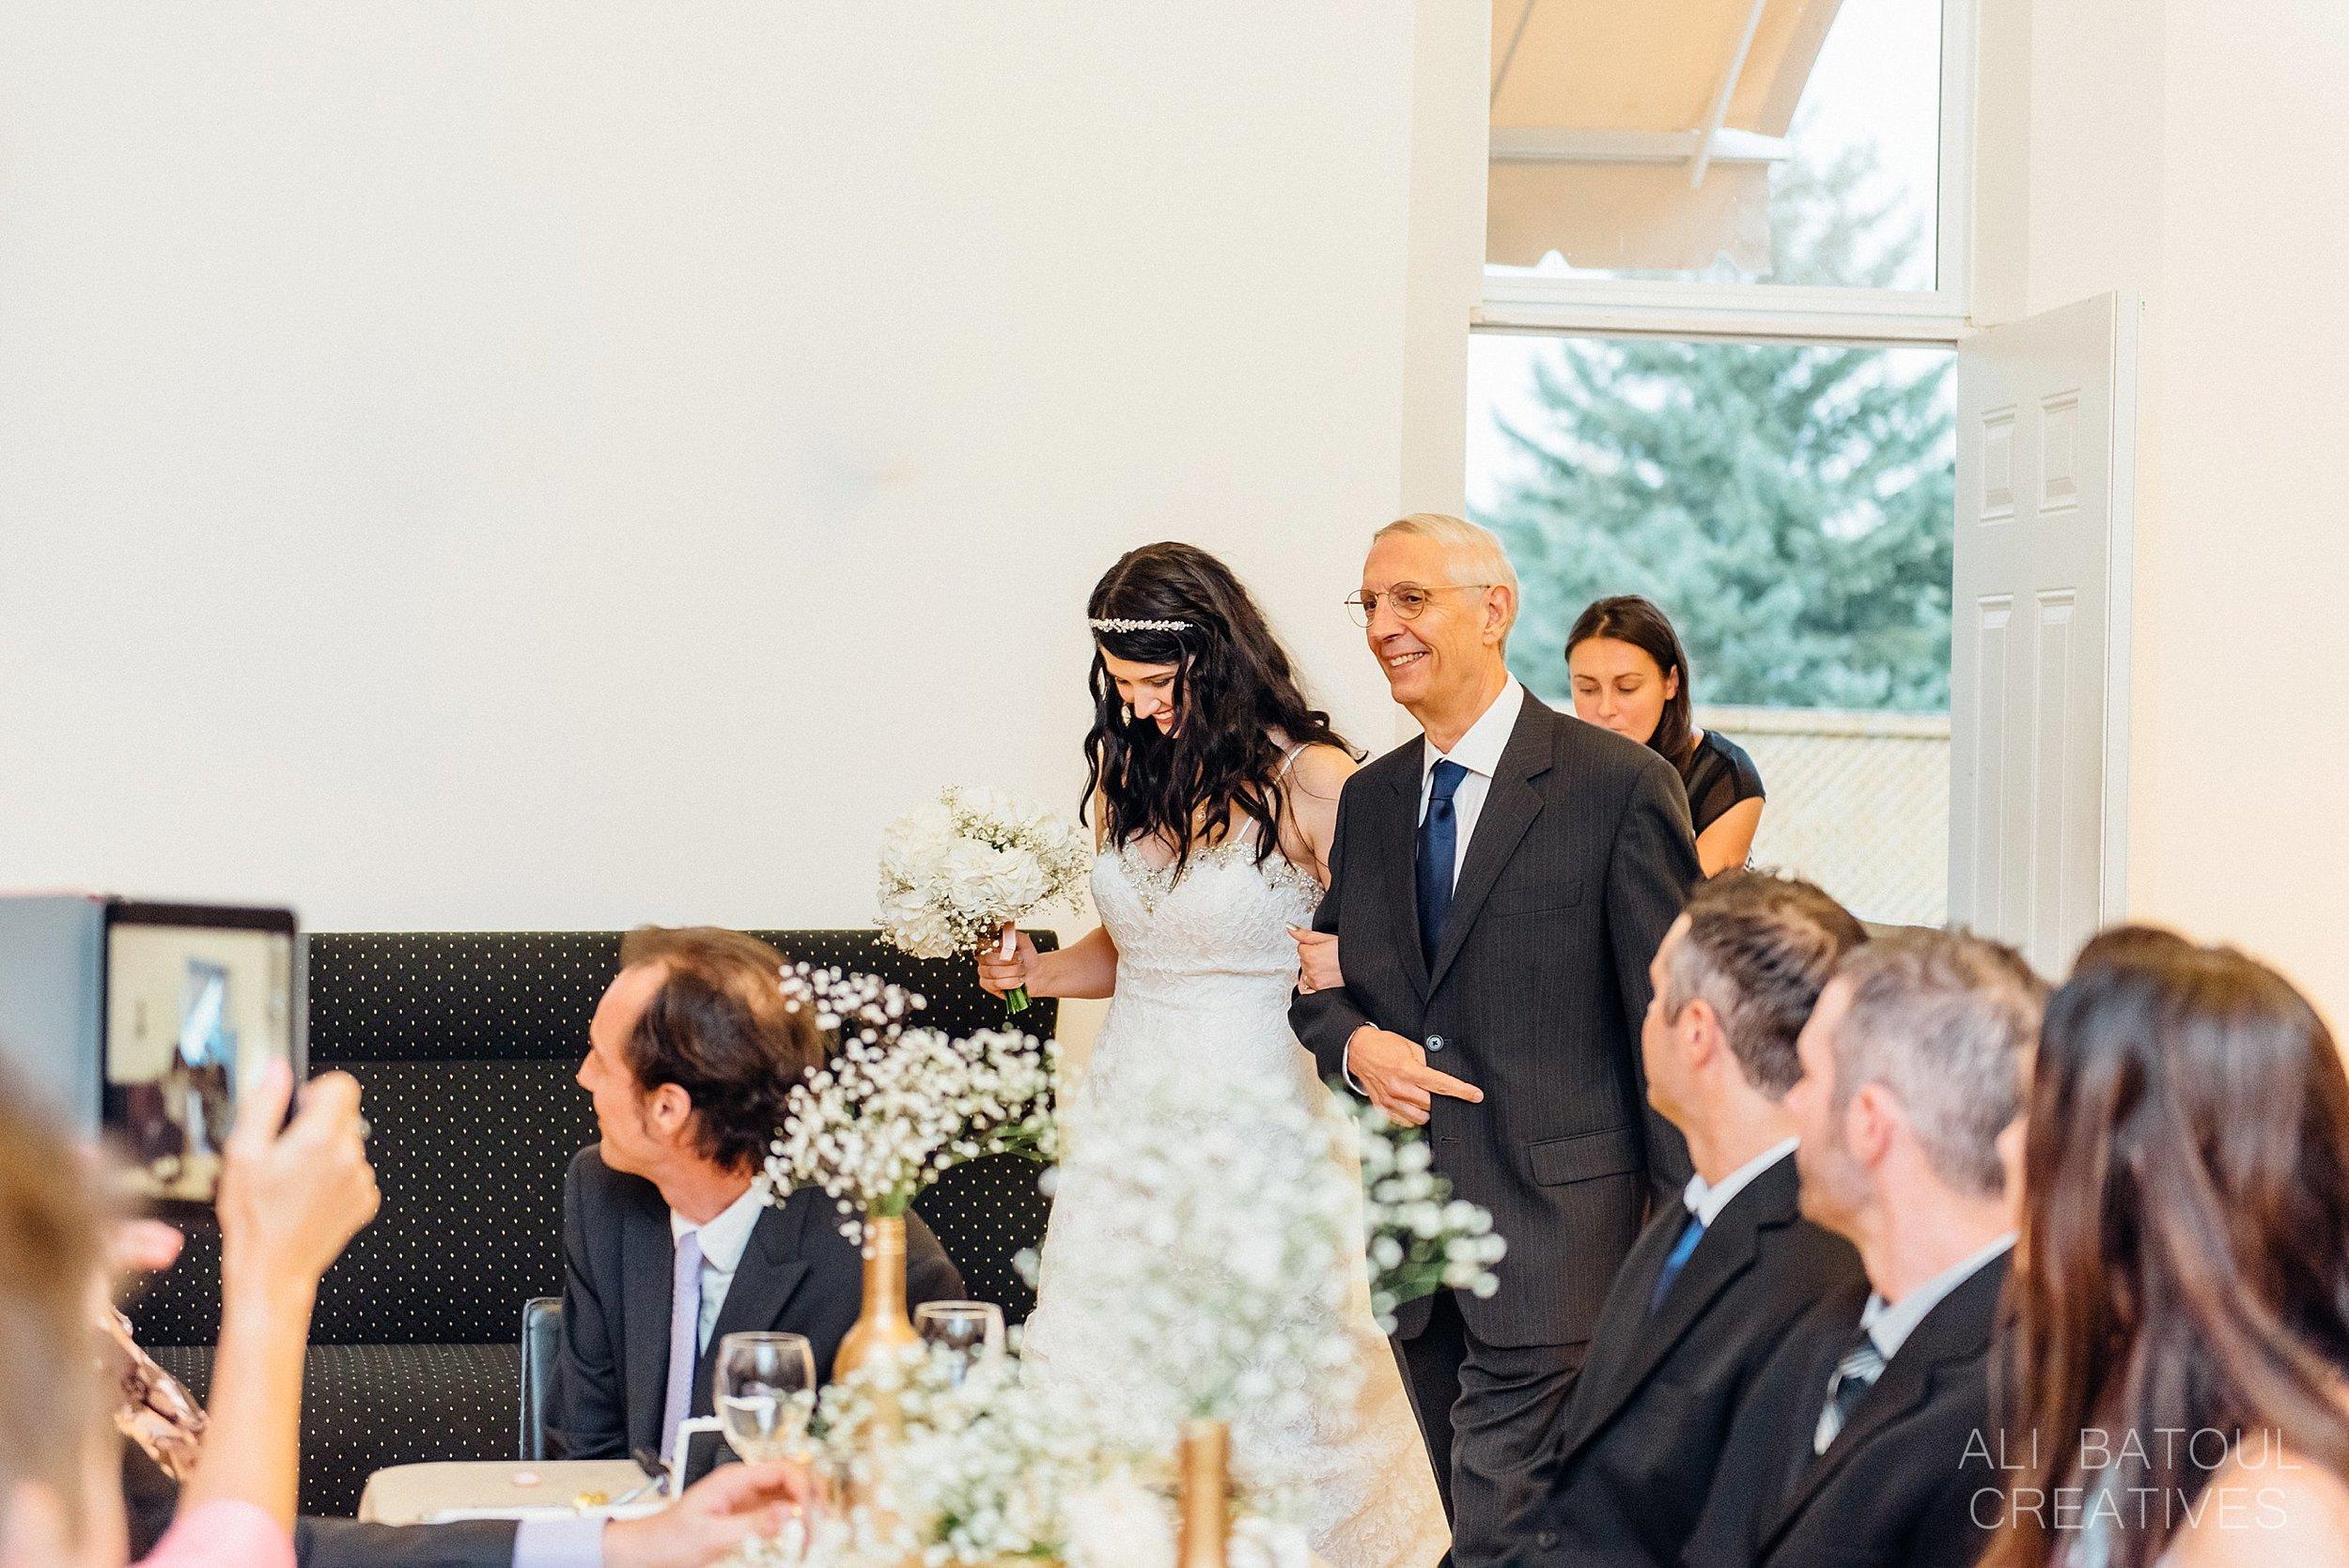 Jocelyn + Steve At The Schoolhouse Wedding - Ali and Batoul Fine Art Wedding Photography_0063.jpg